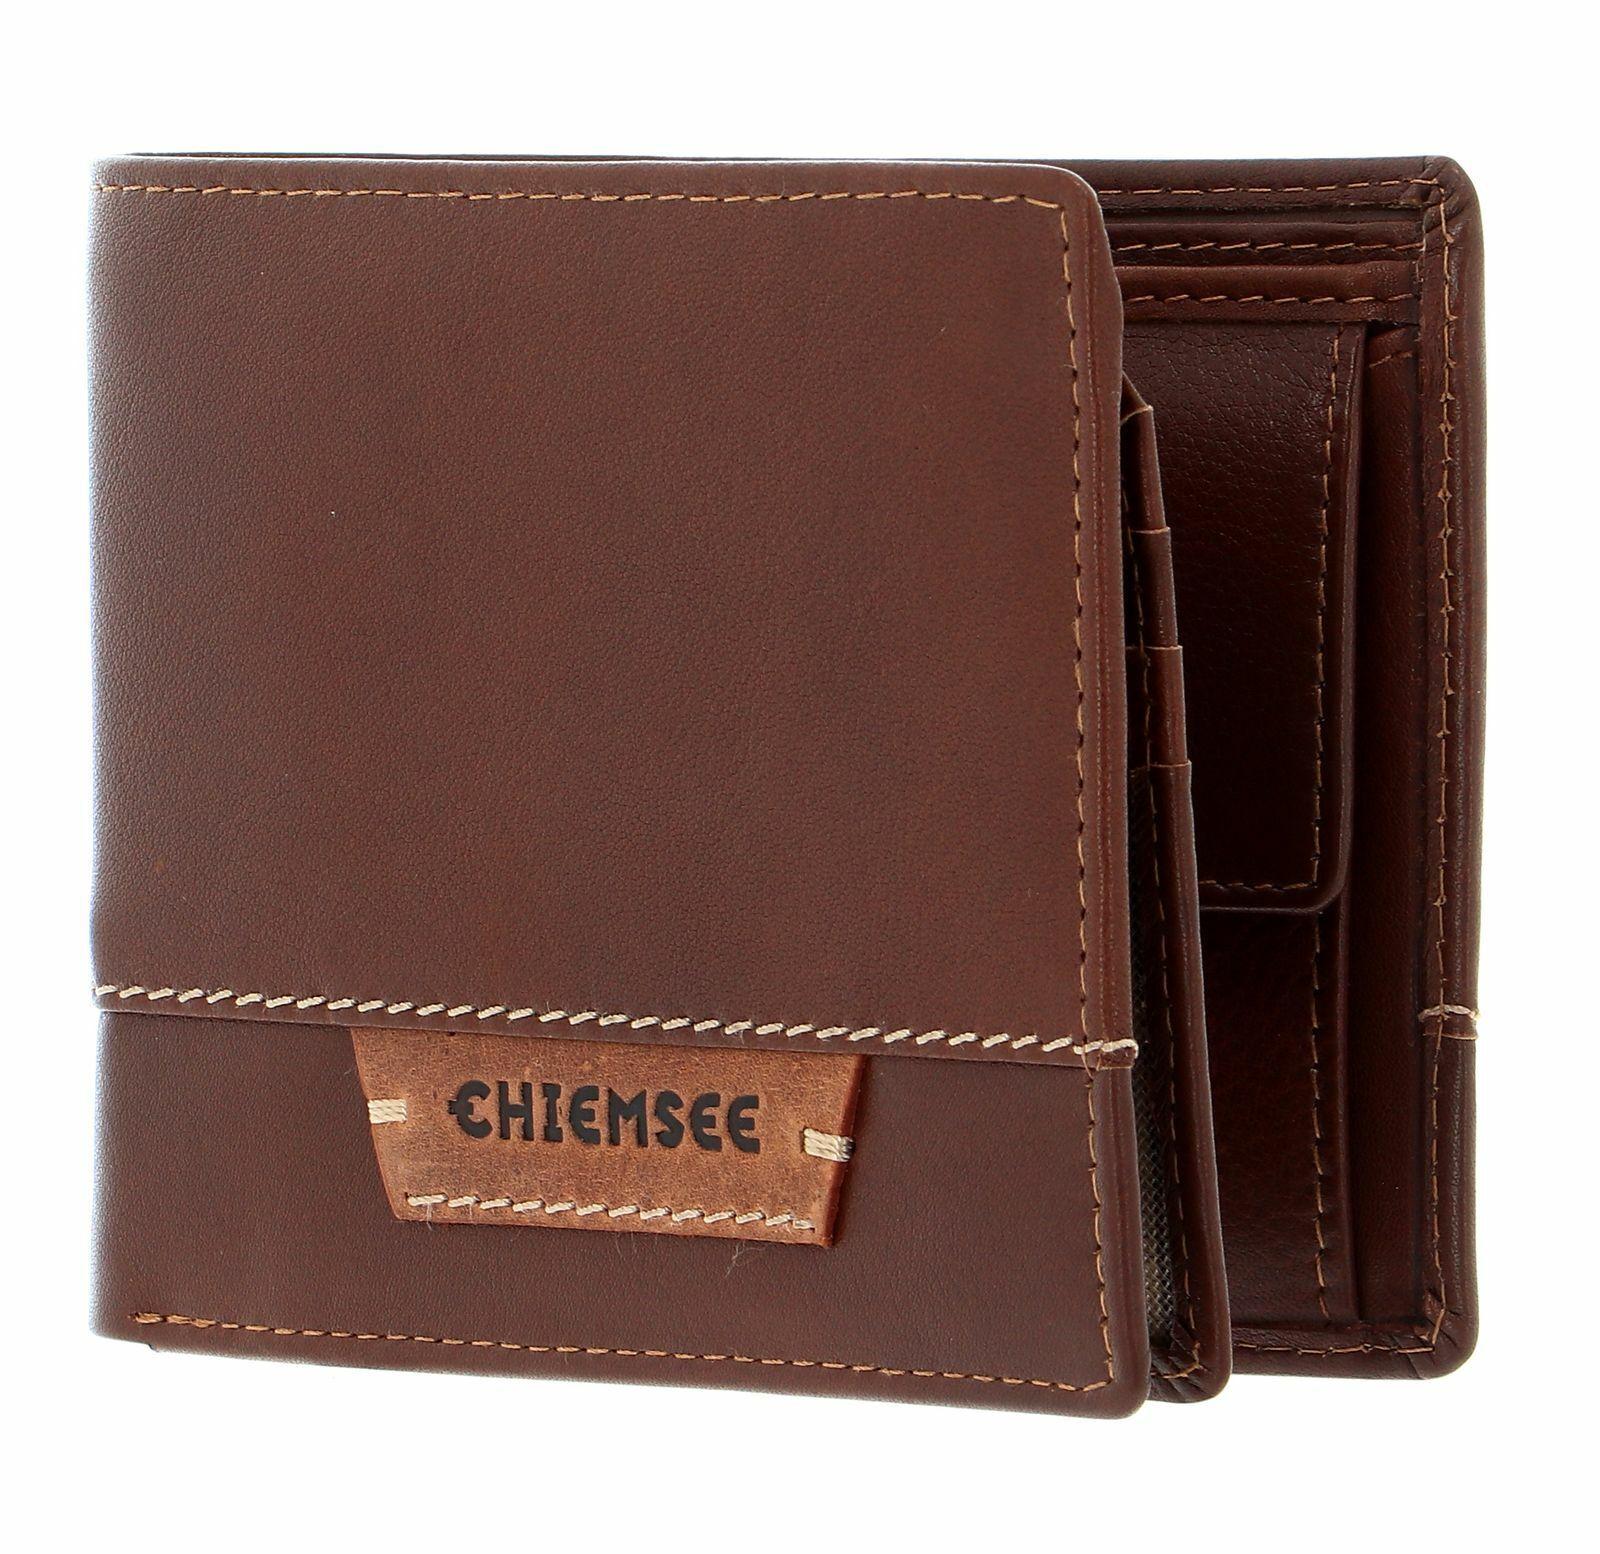 CHIEMSEE Paraguay Wallet With Flap Geldbörse Cognac Braun Neu